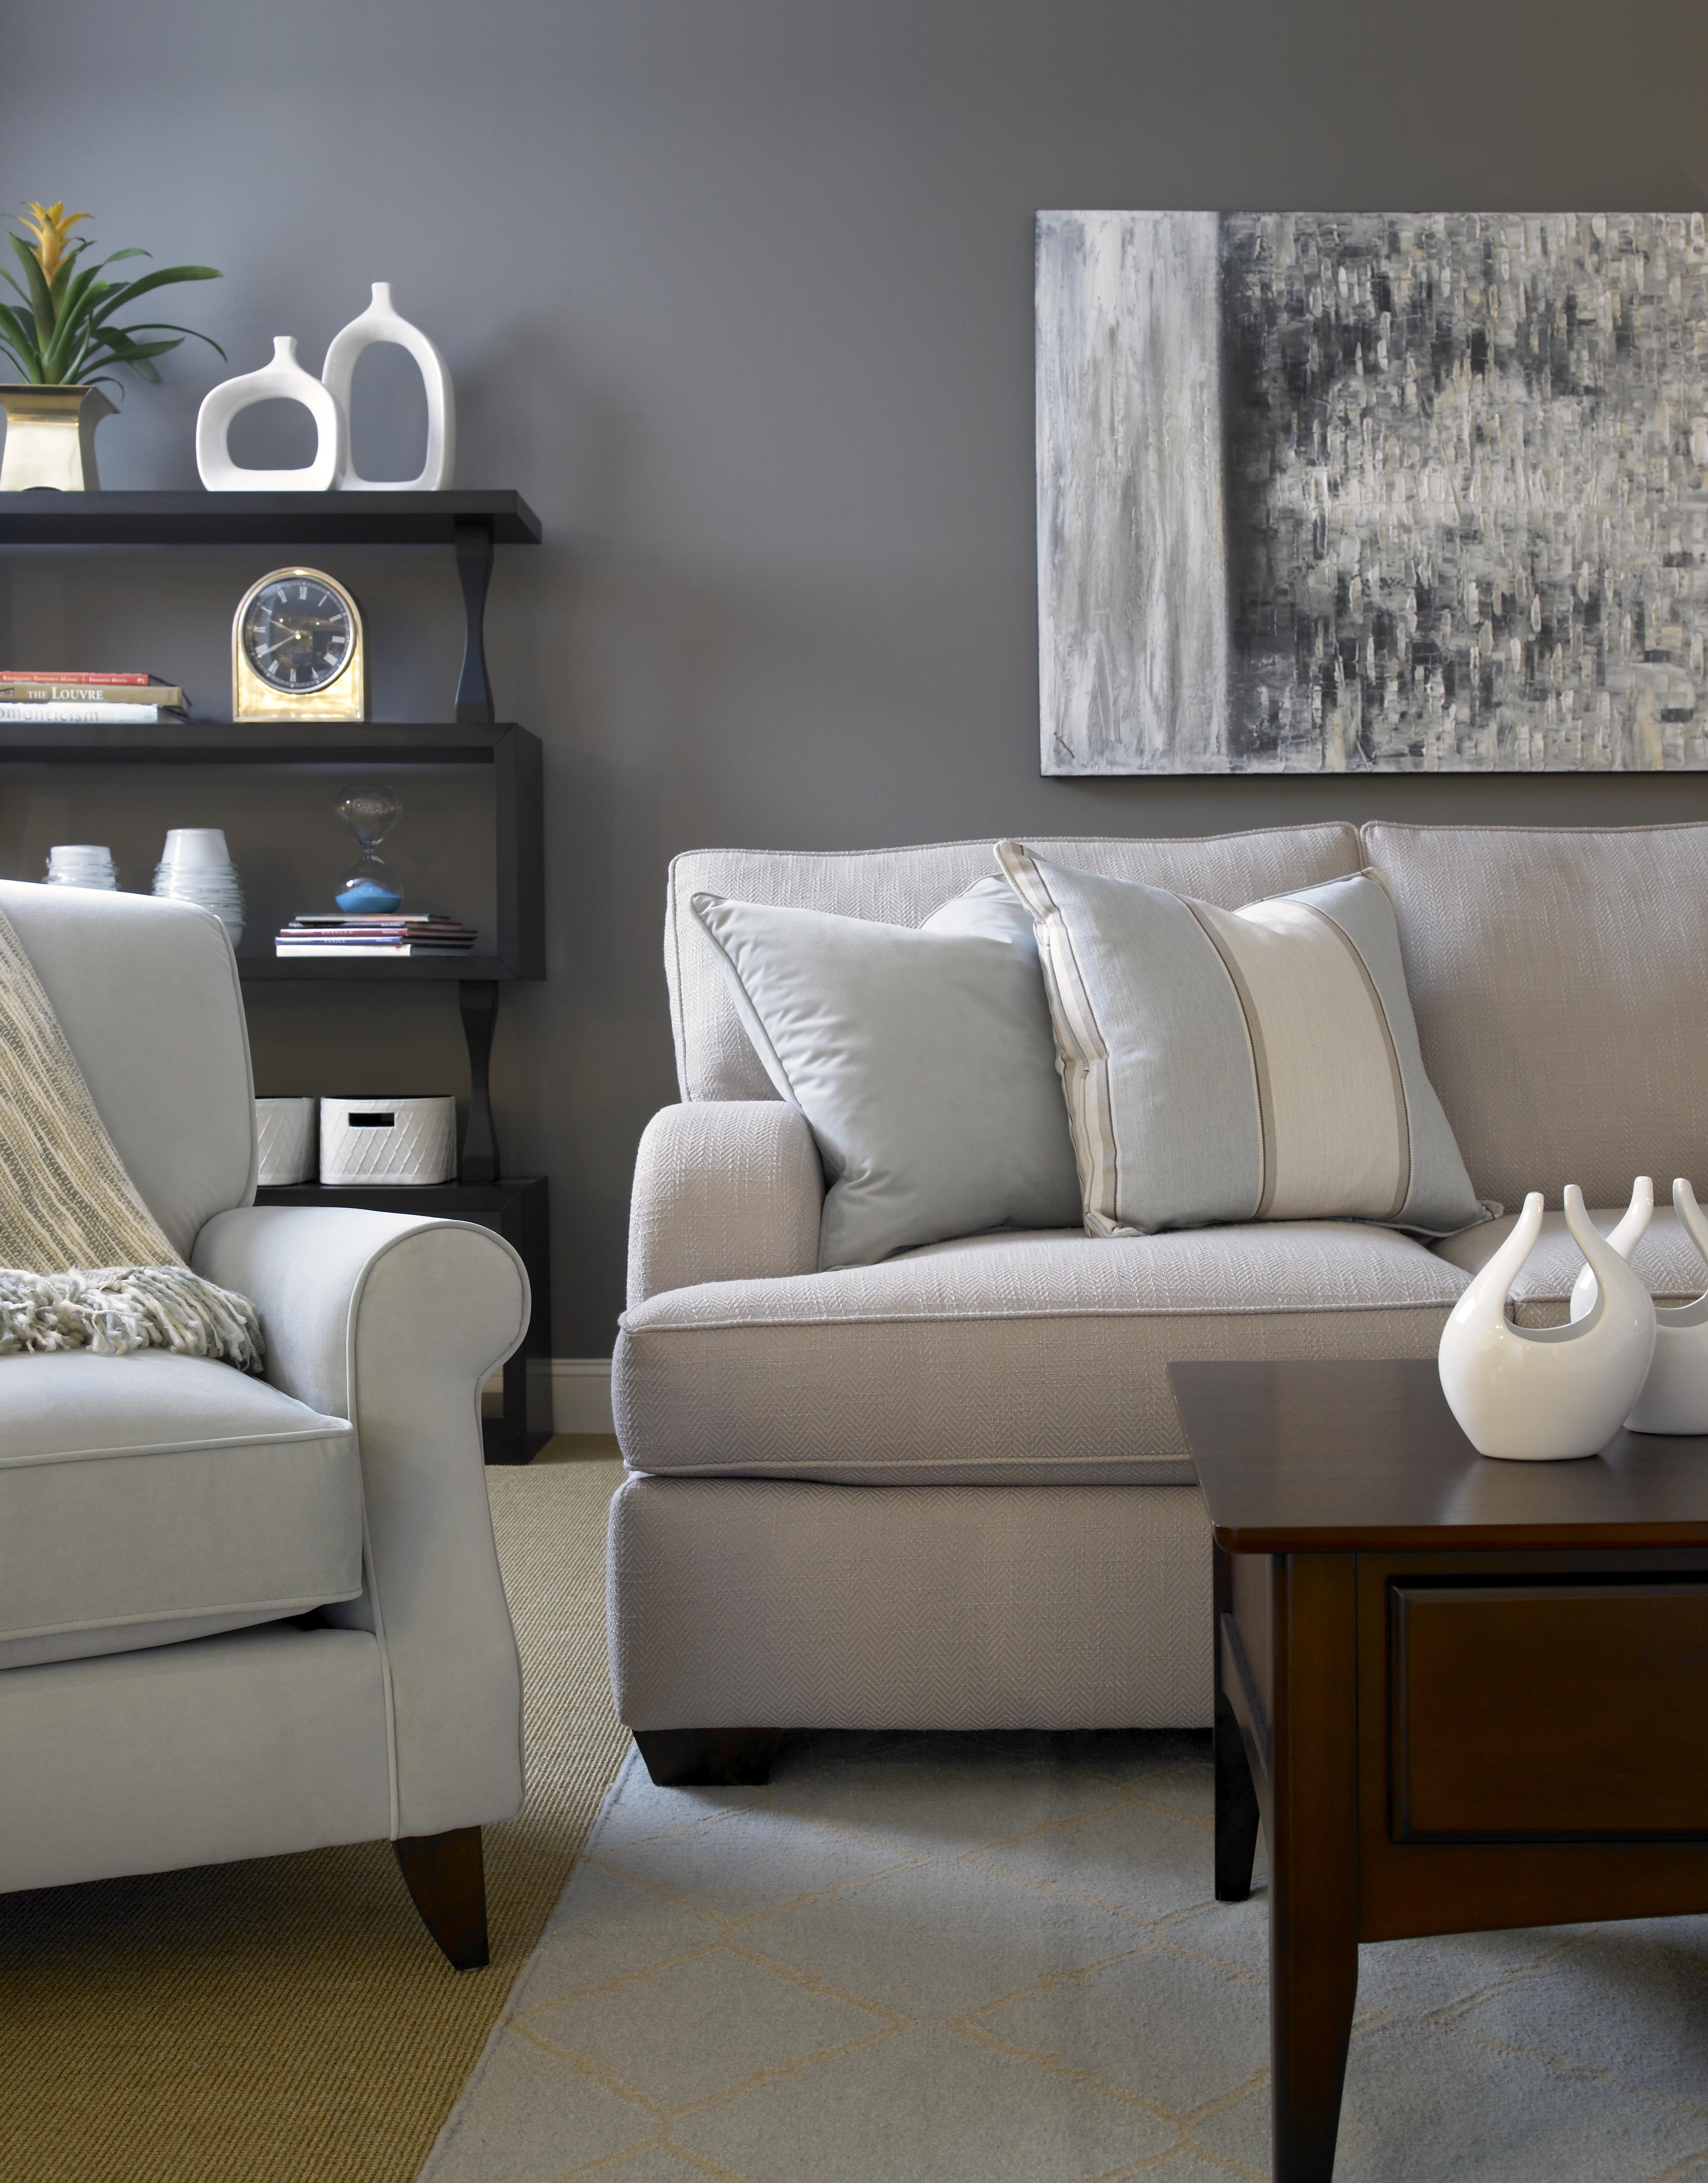 leon s mackenzie sofa folding mattress sklar peppler quality furniture ajax sofas sectionals